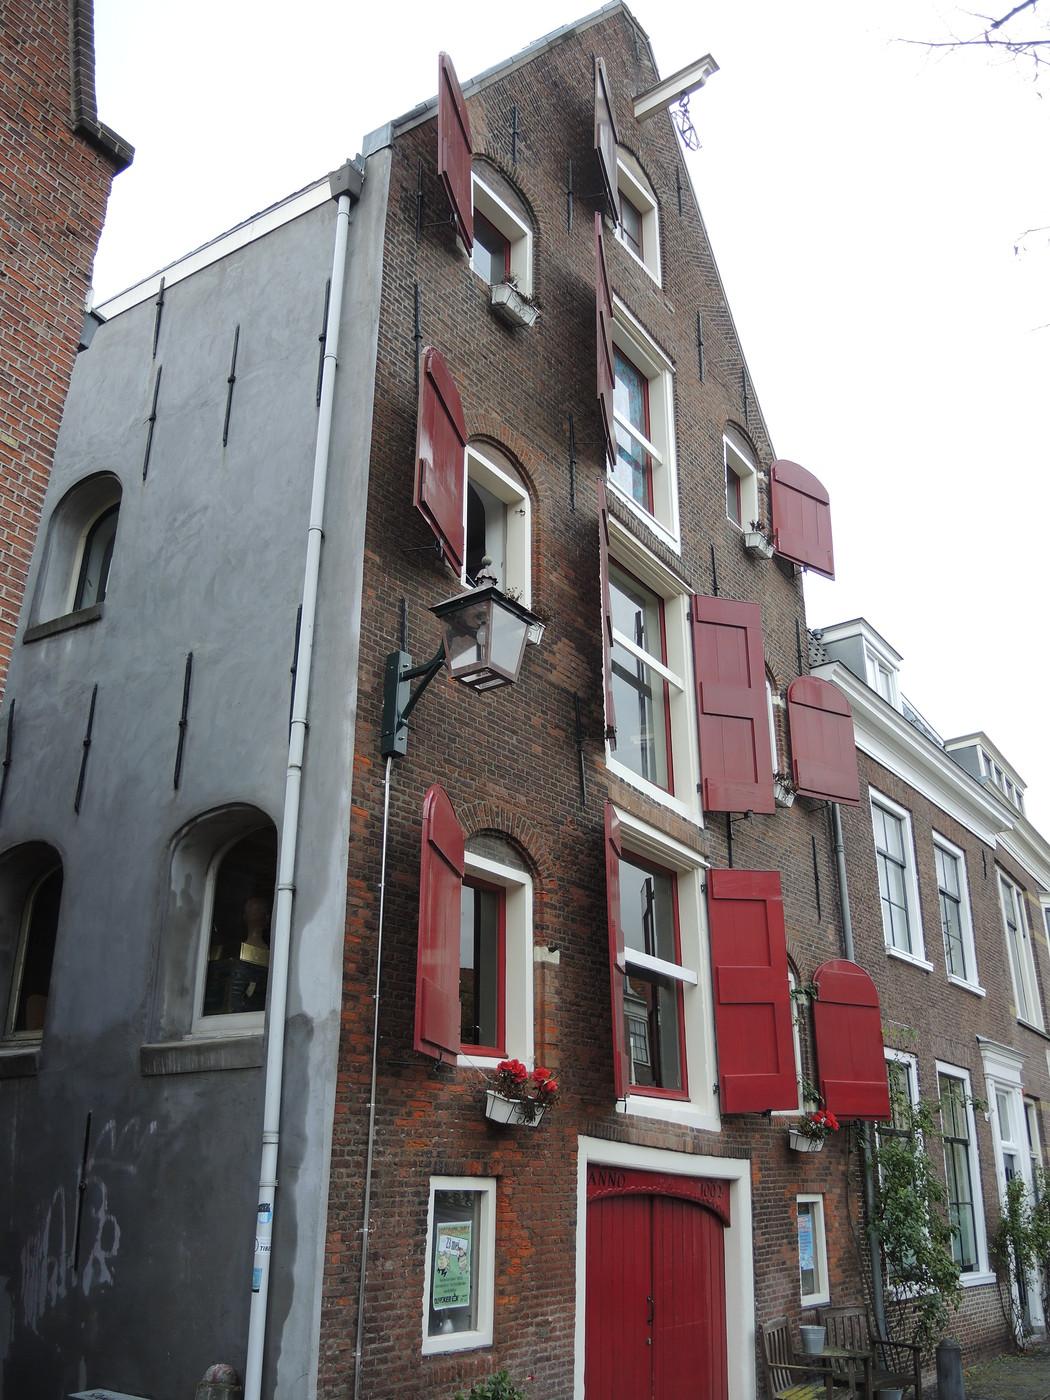 20151007 150022_Haarlem.jpg